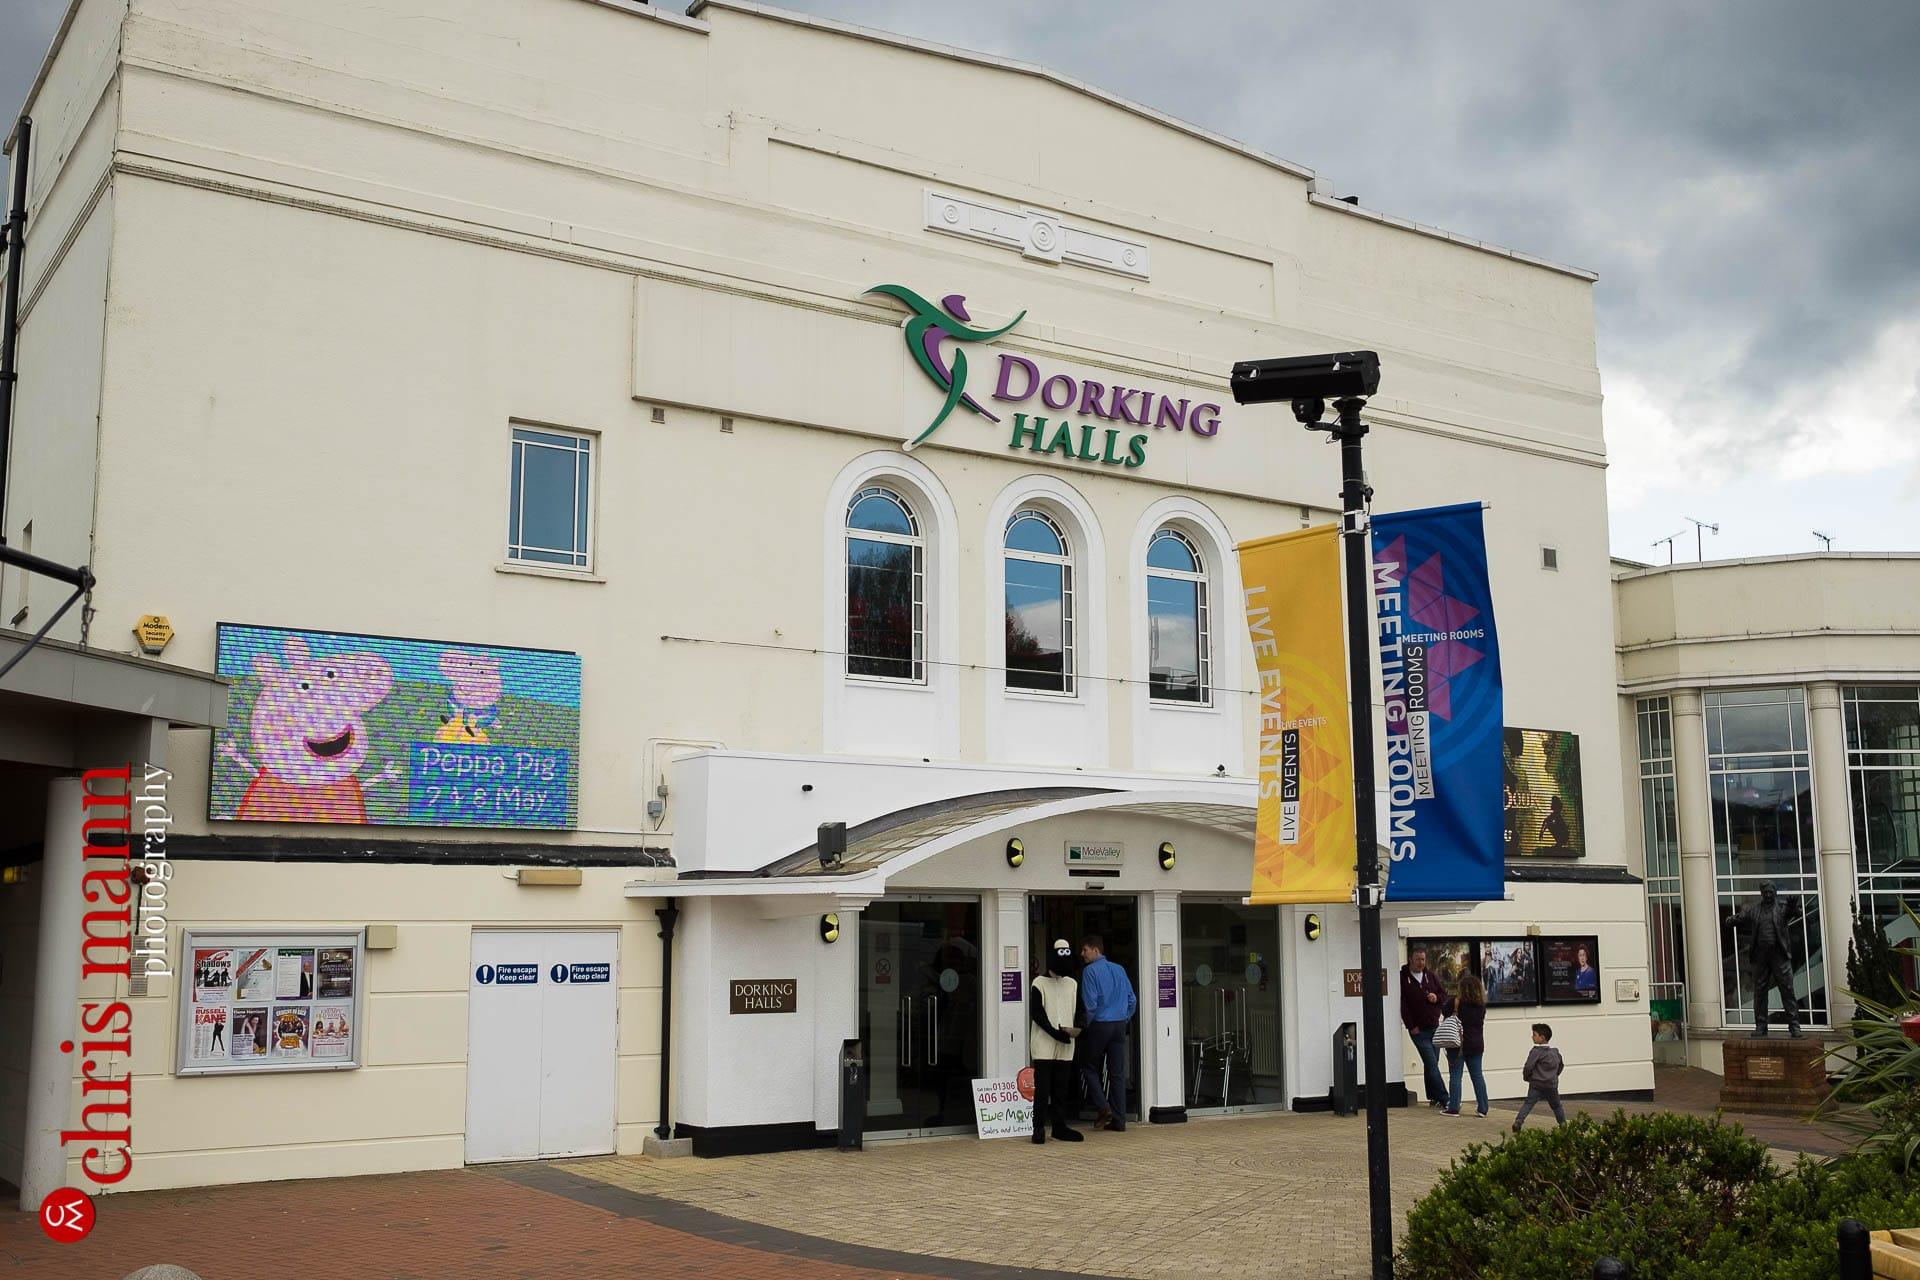 Dorking Halls Choiroke 2016 concert venue